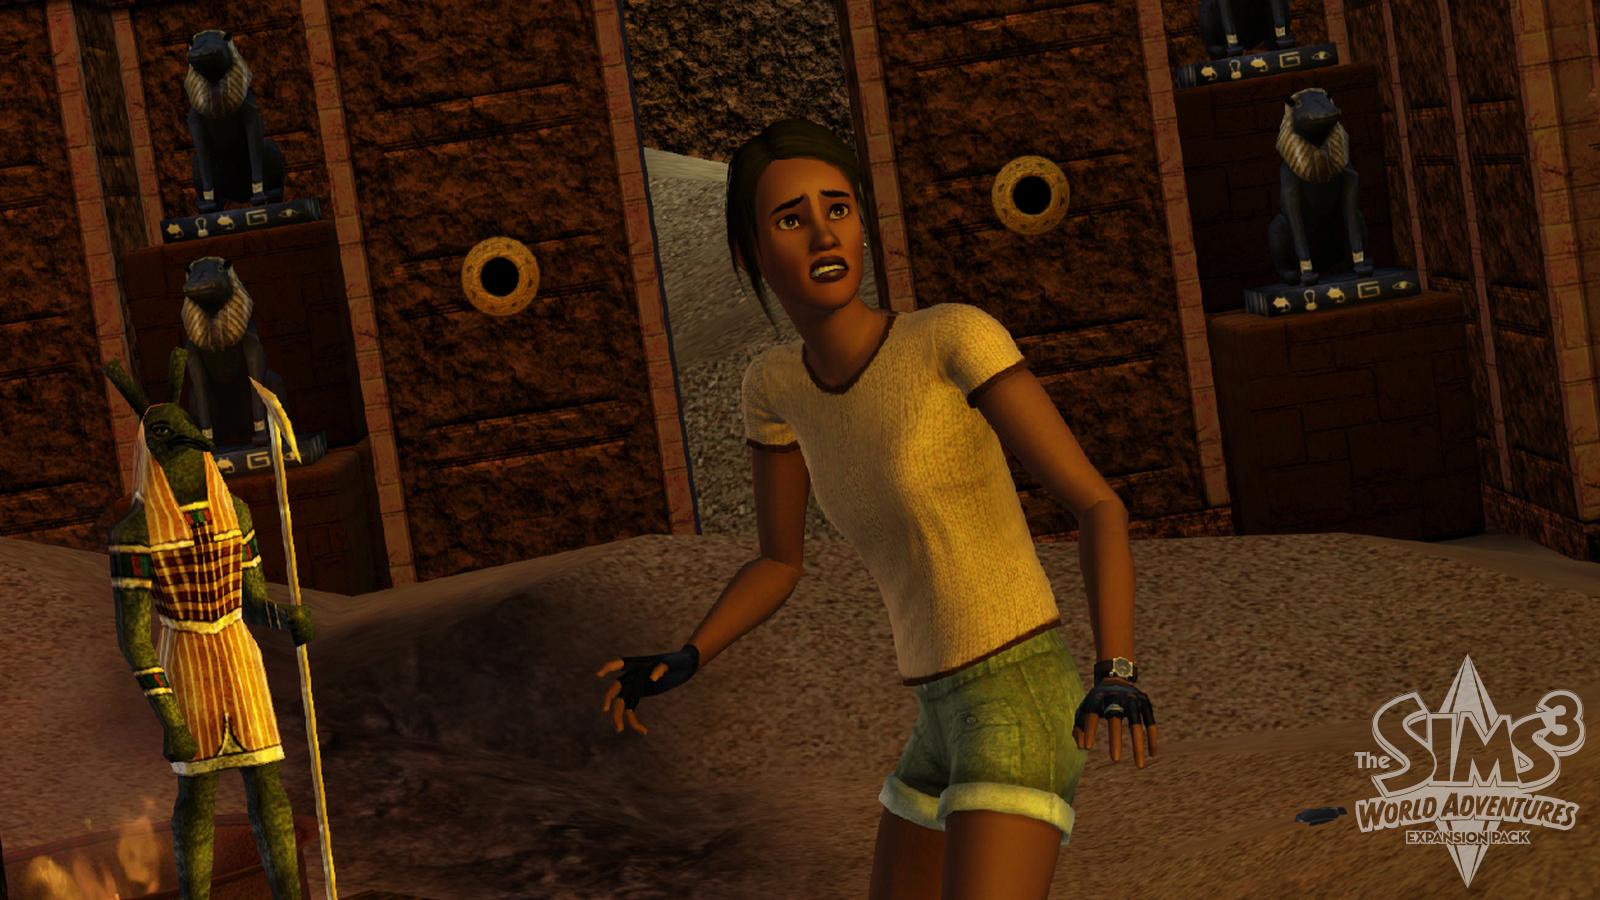 Les Sims 3: Destination Aventure (Win - Mac) - Image 3